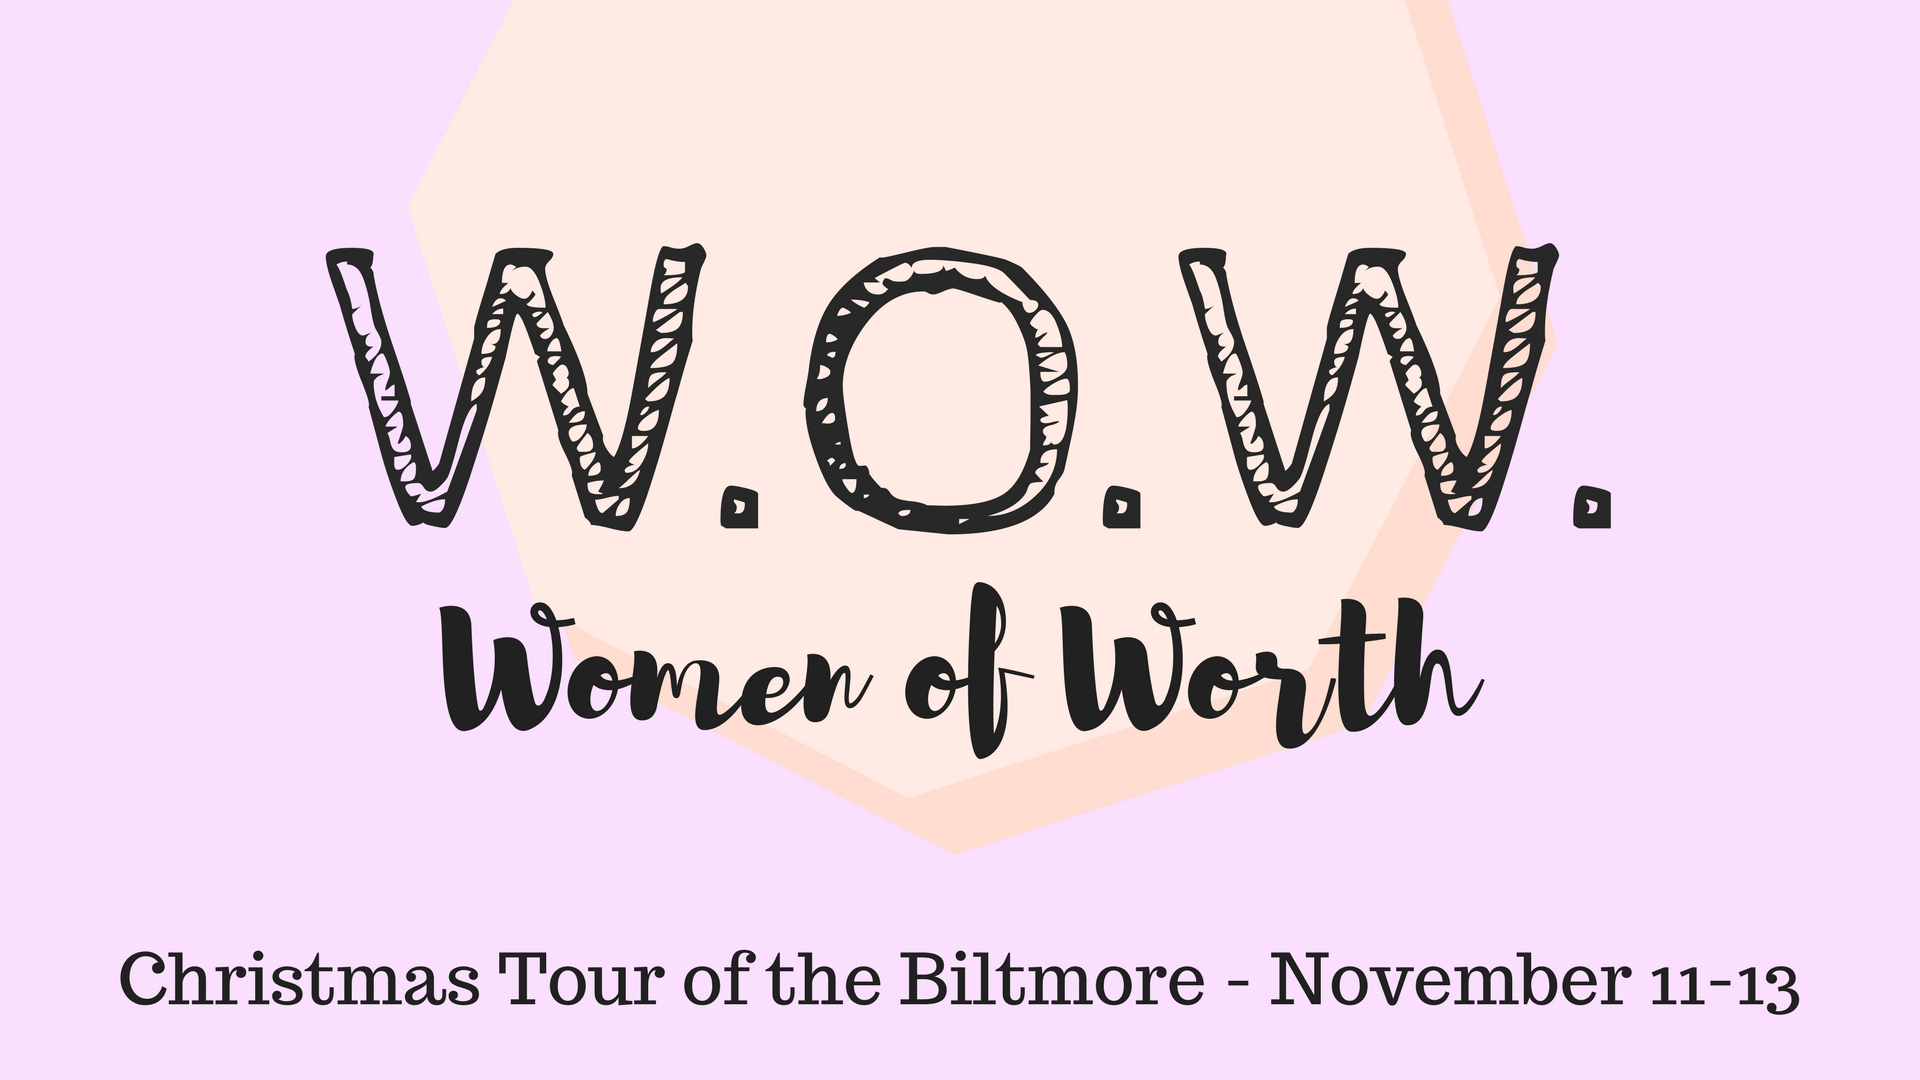 Wow biltmore trip